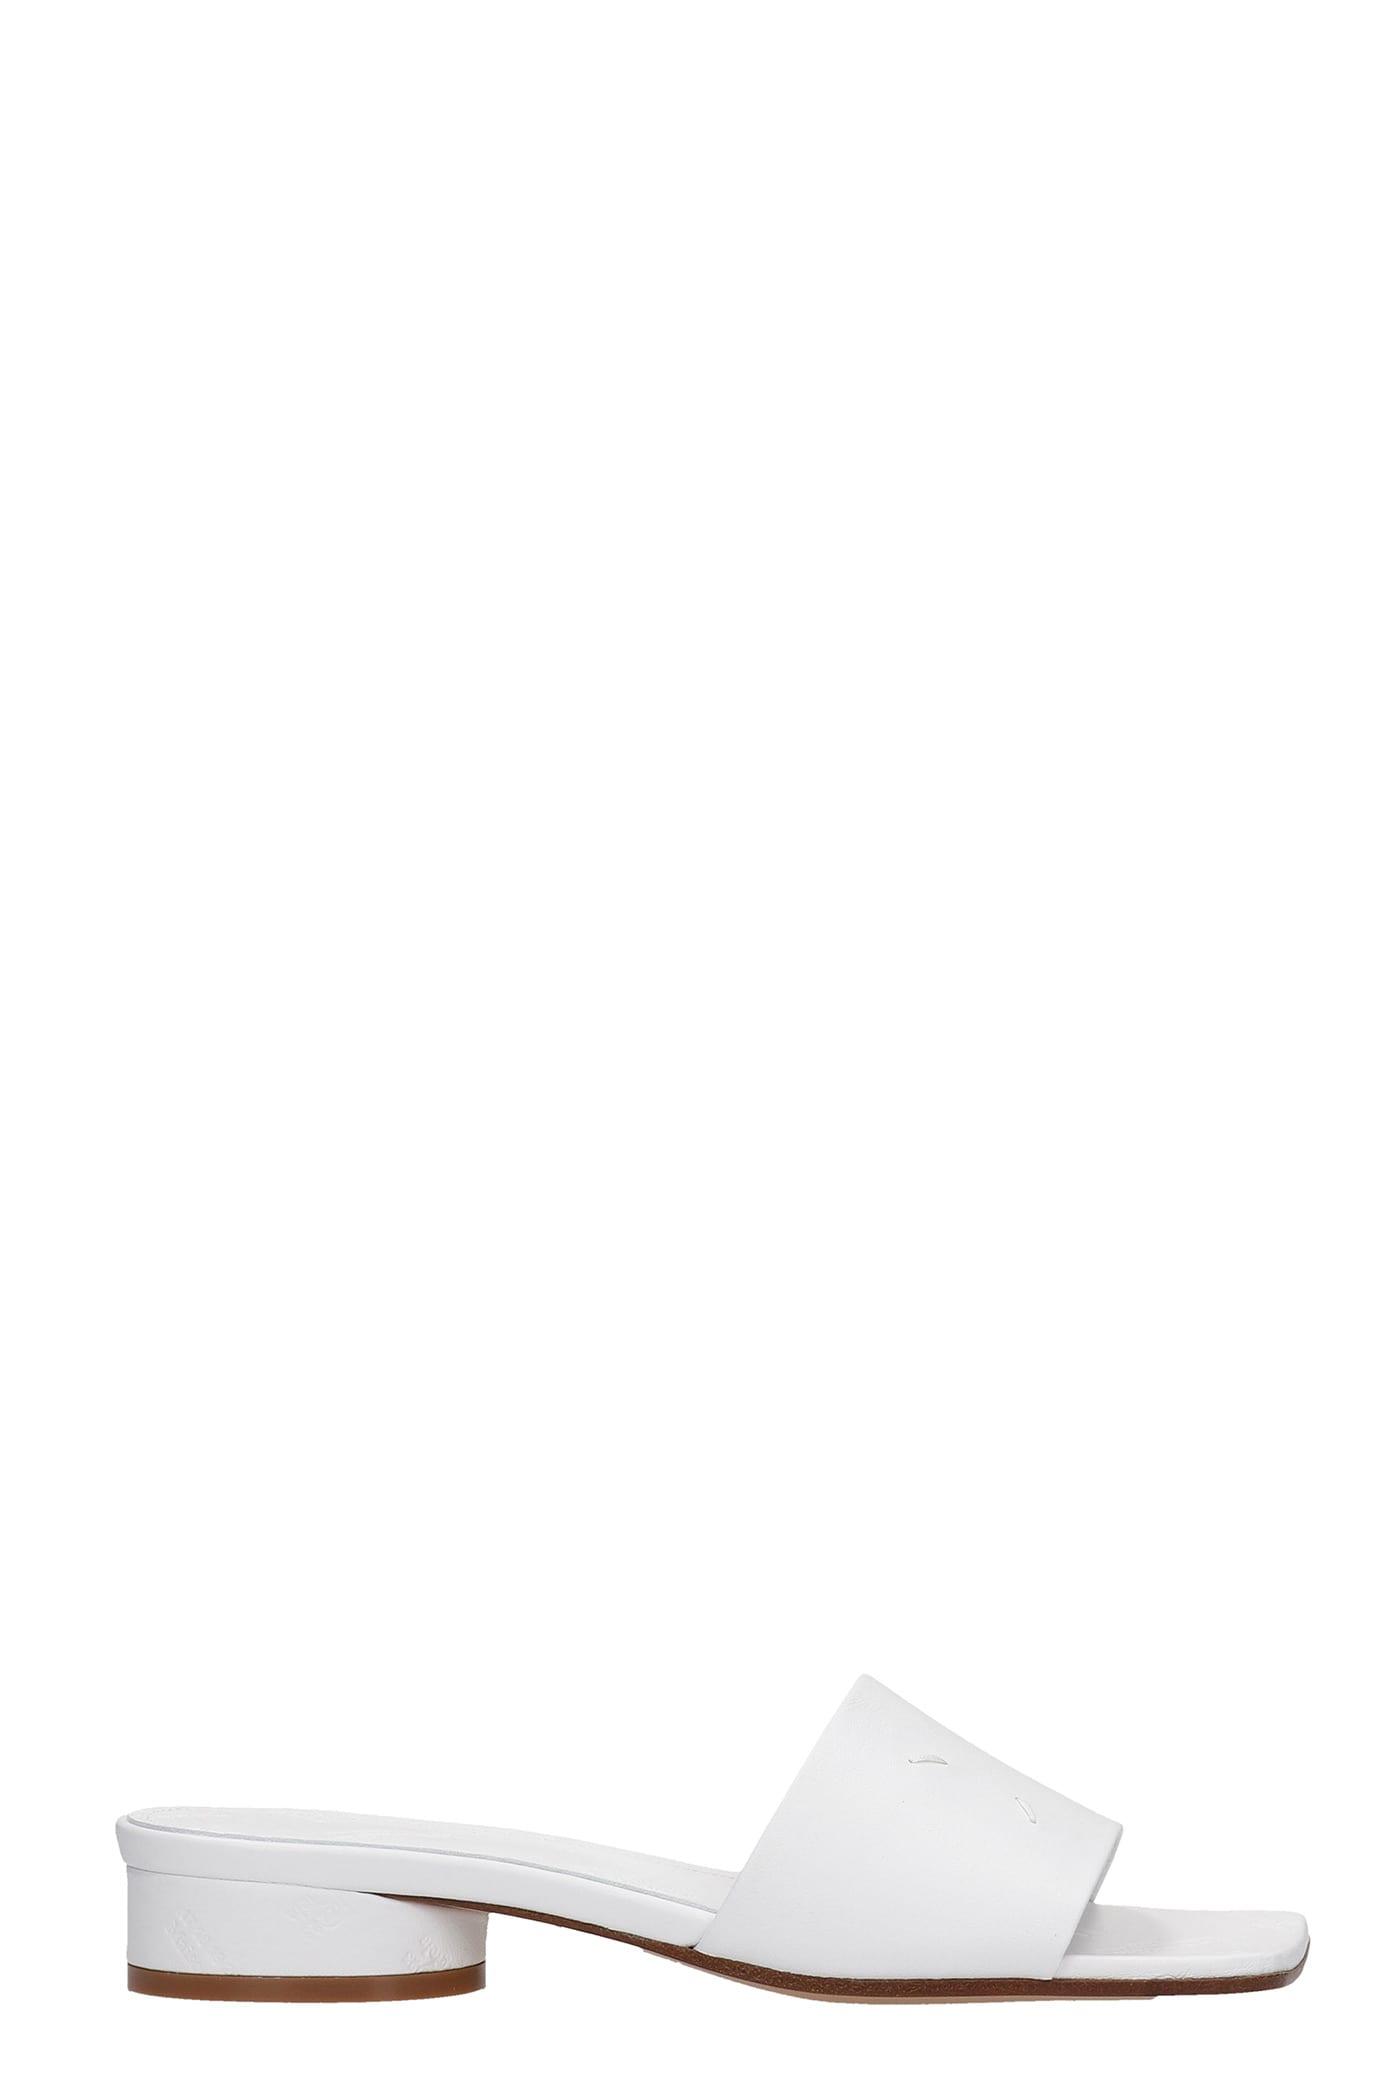 Buy Maison Margiela Flats In White Leather online, shop Maison Margiela shoes with free shipping